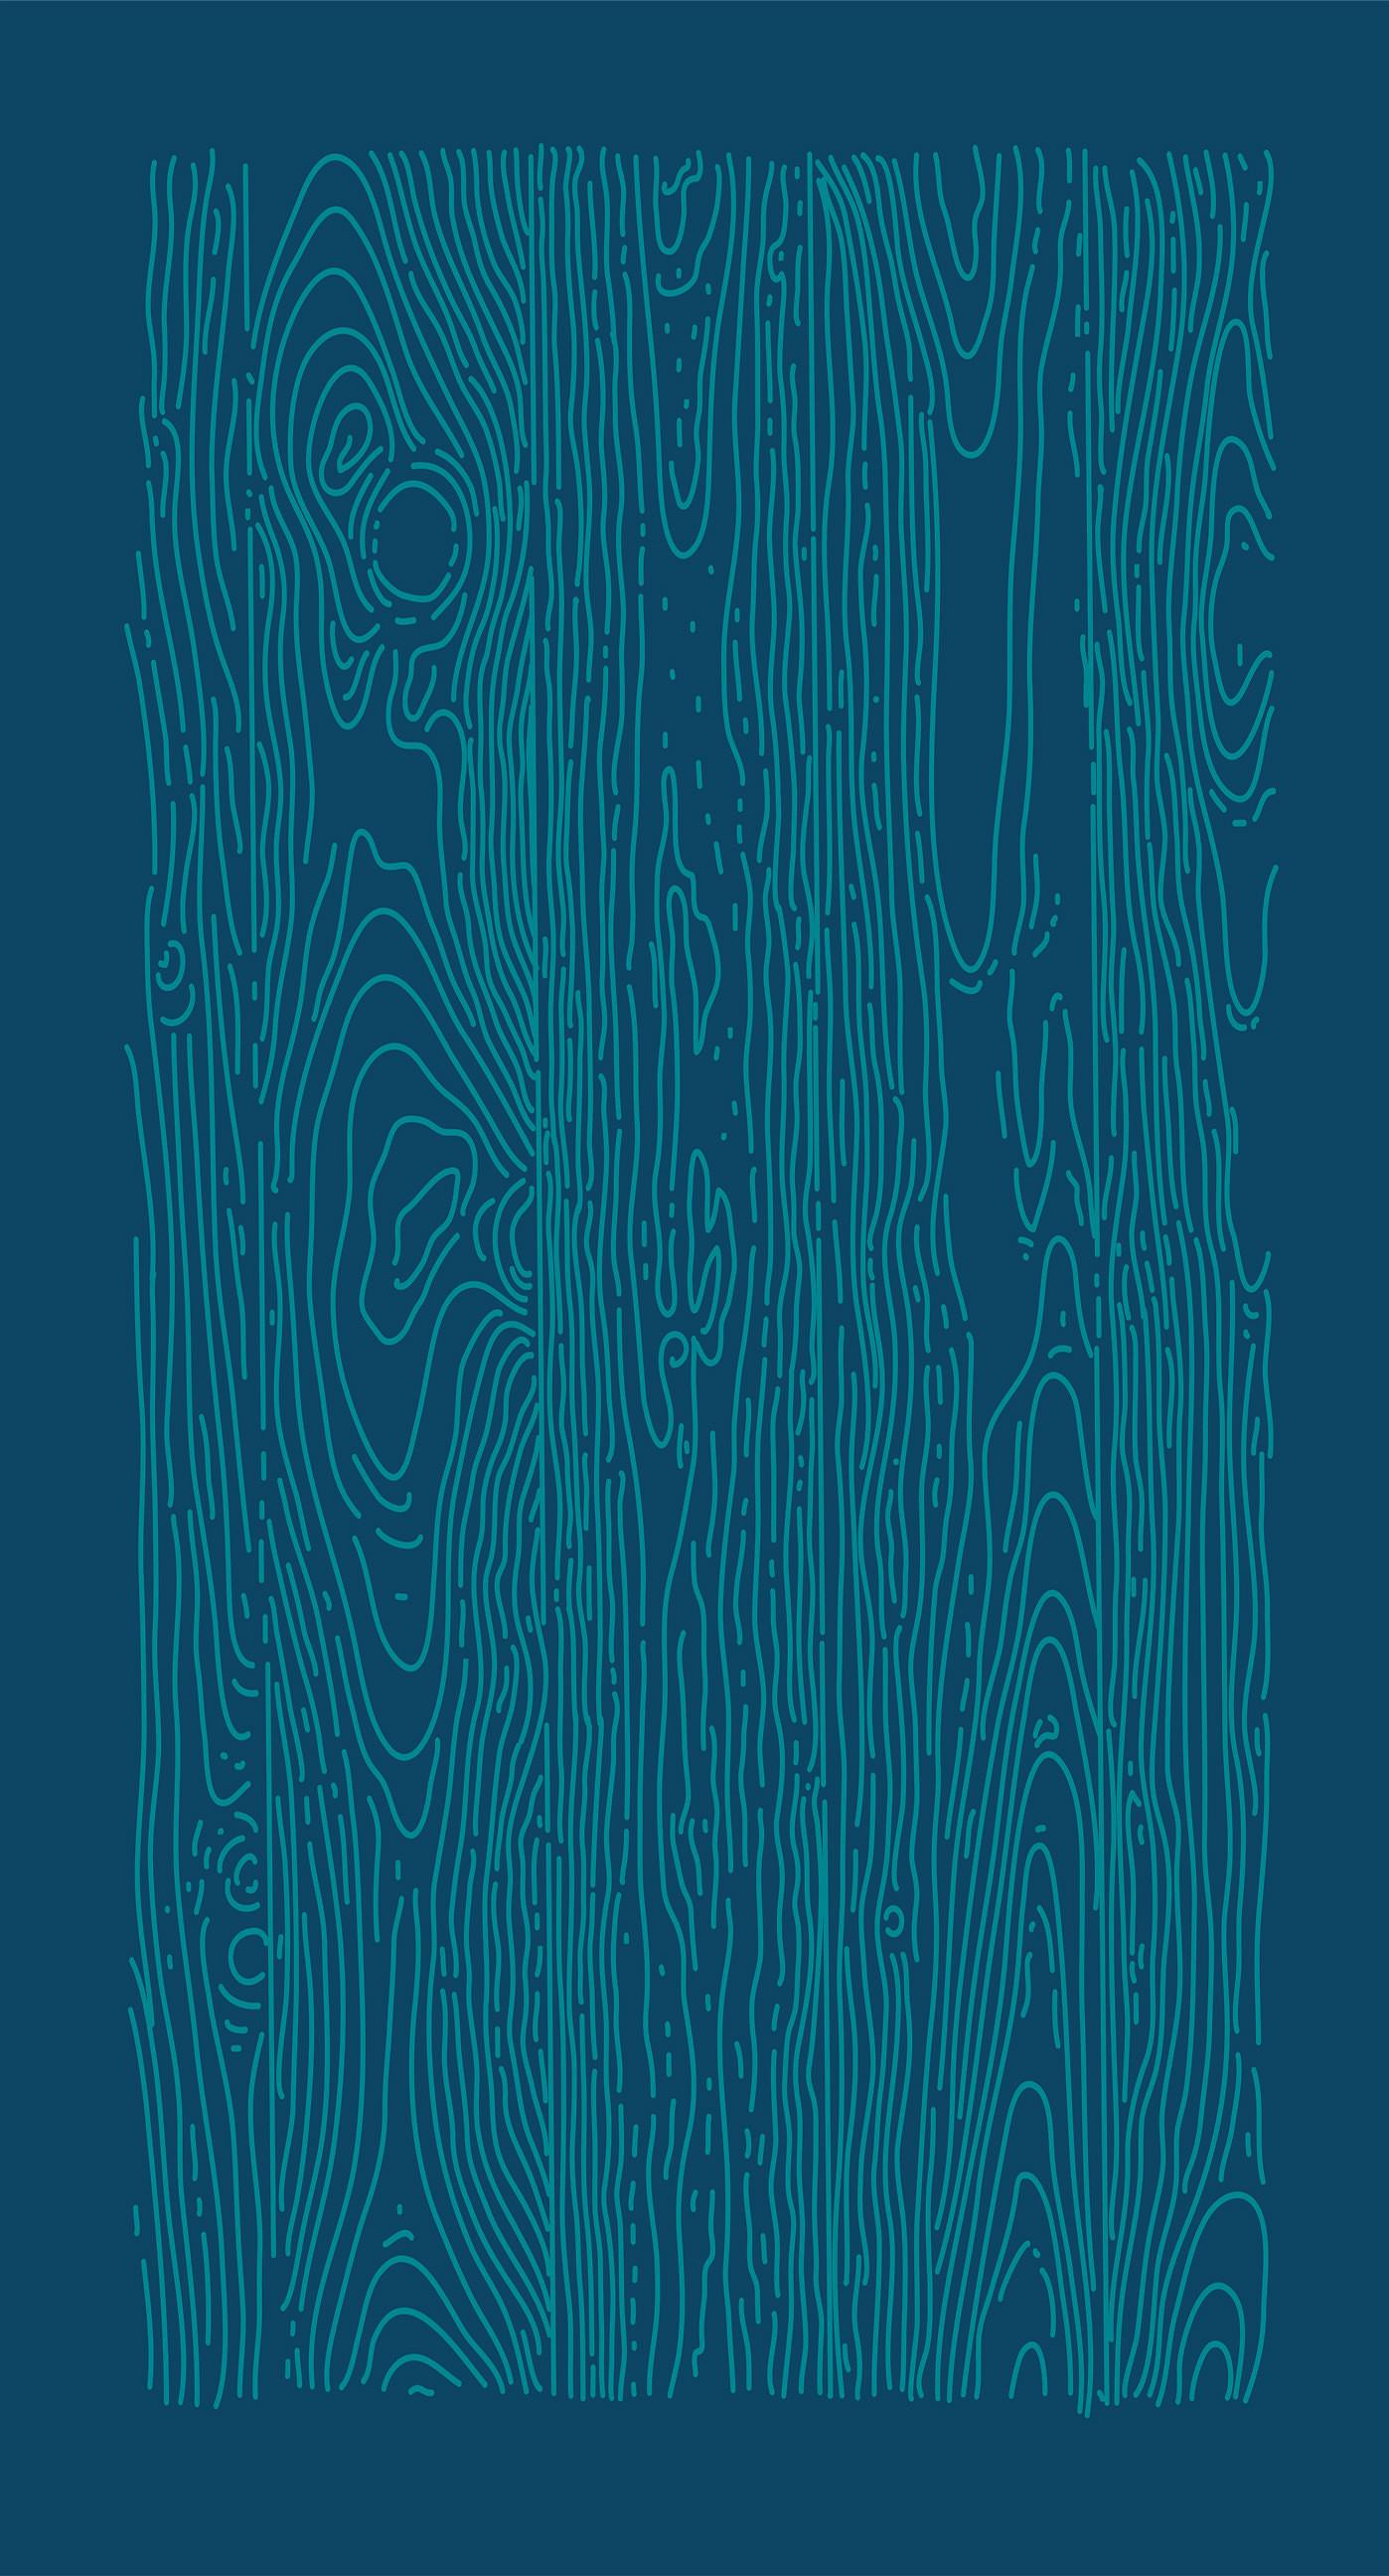 1920x1080 Wallpaper Plain Dark Blue Desktop Background 1920 1080 Forest Epic Wallpaperz